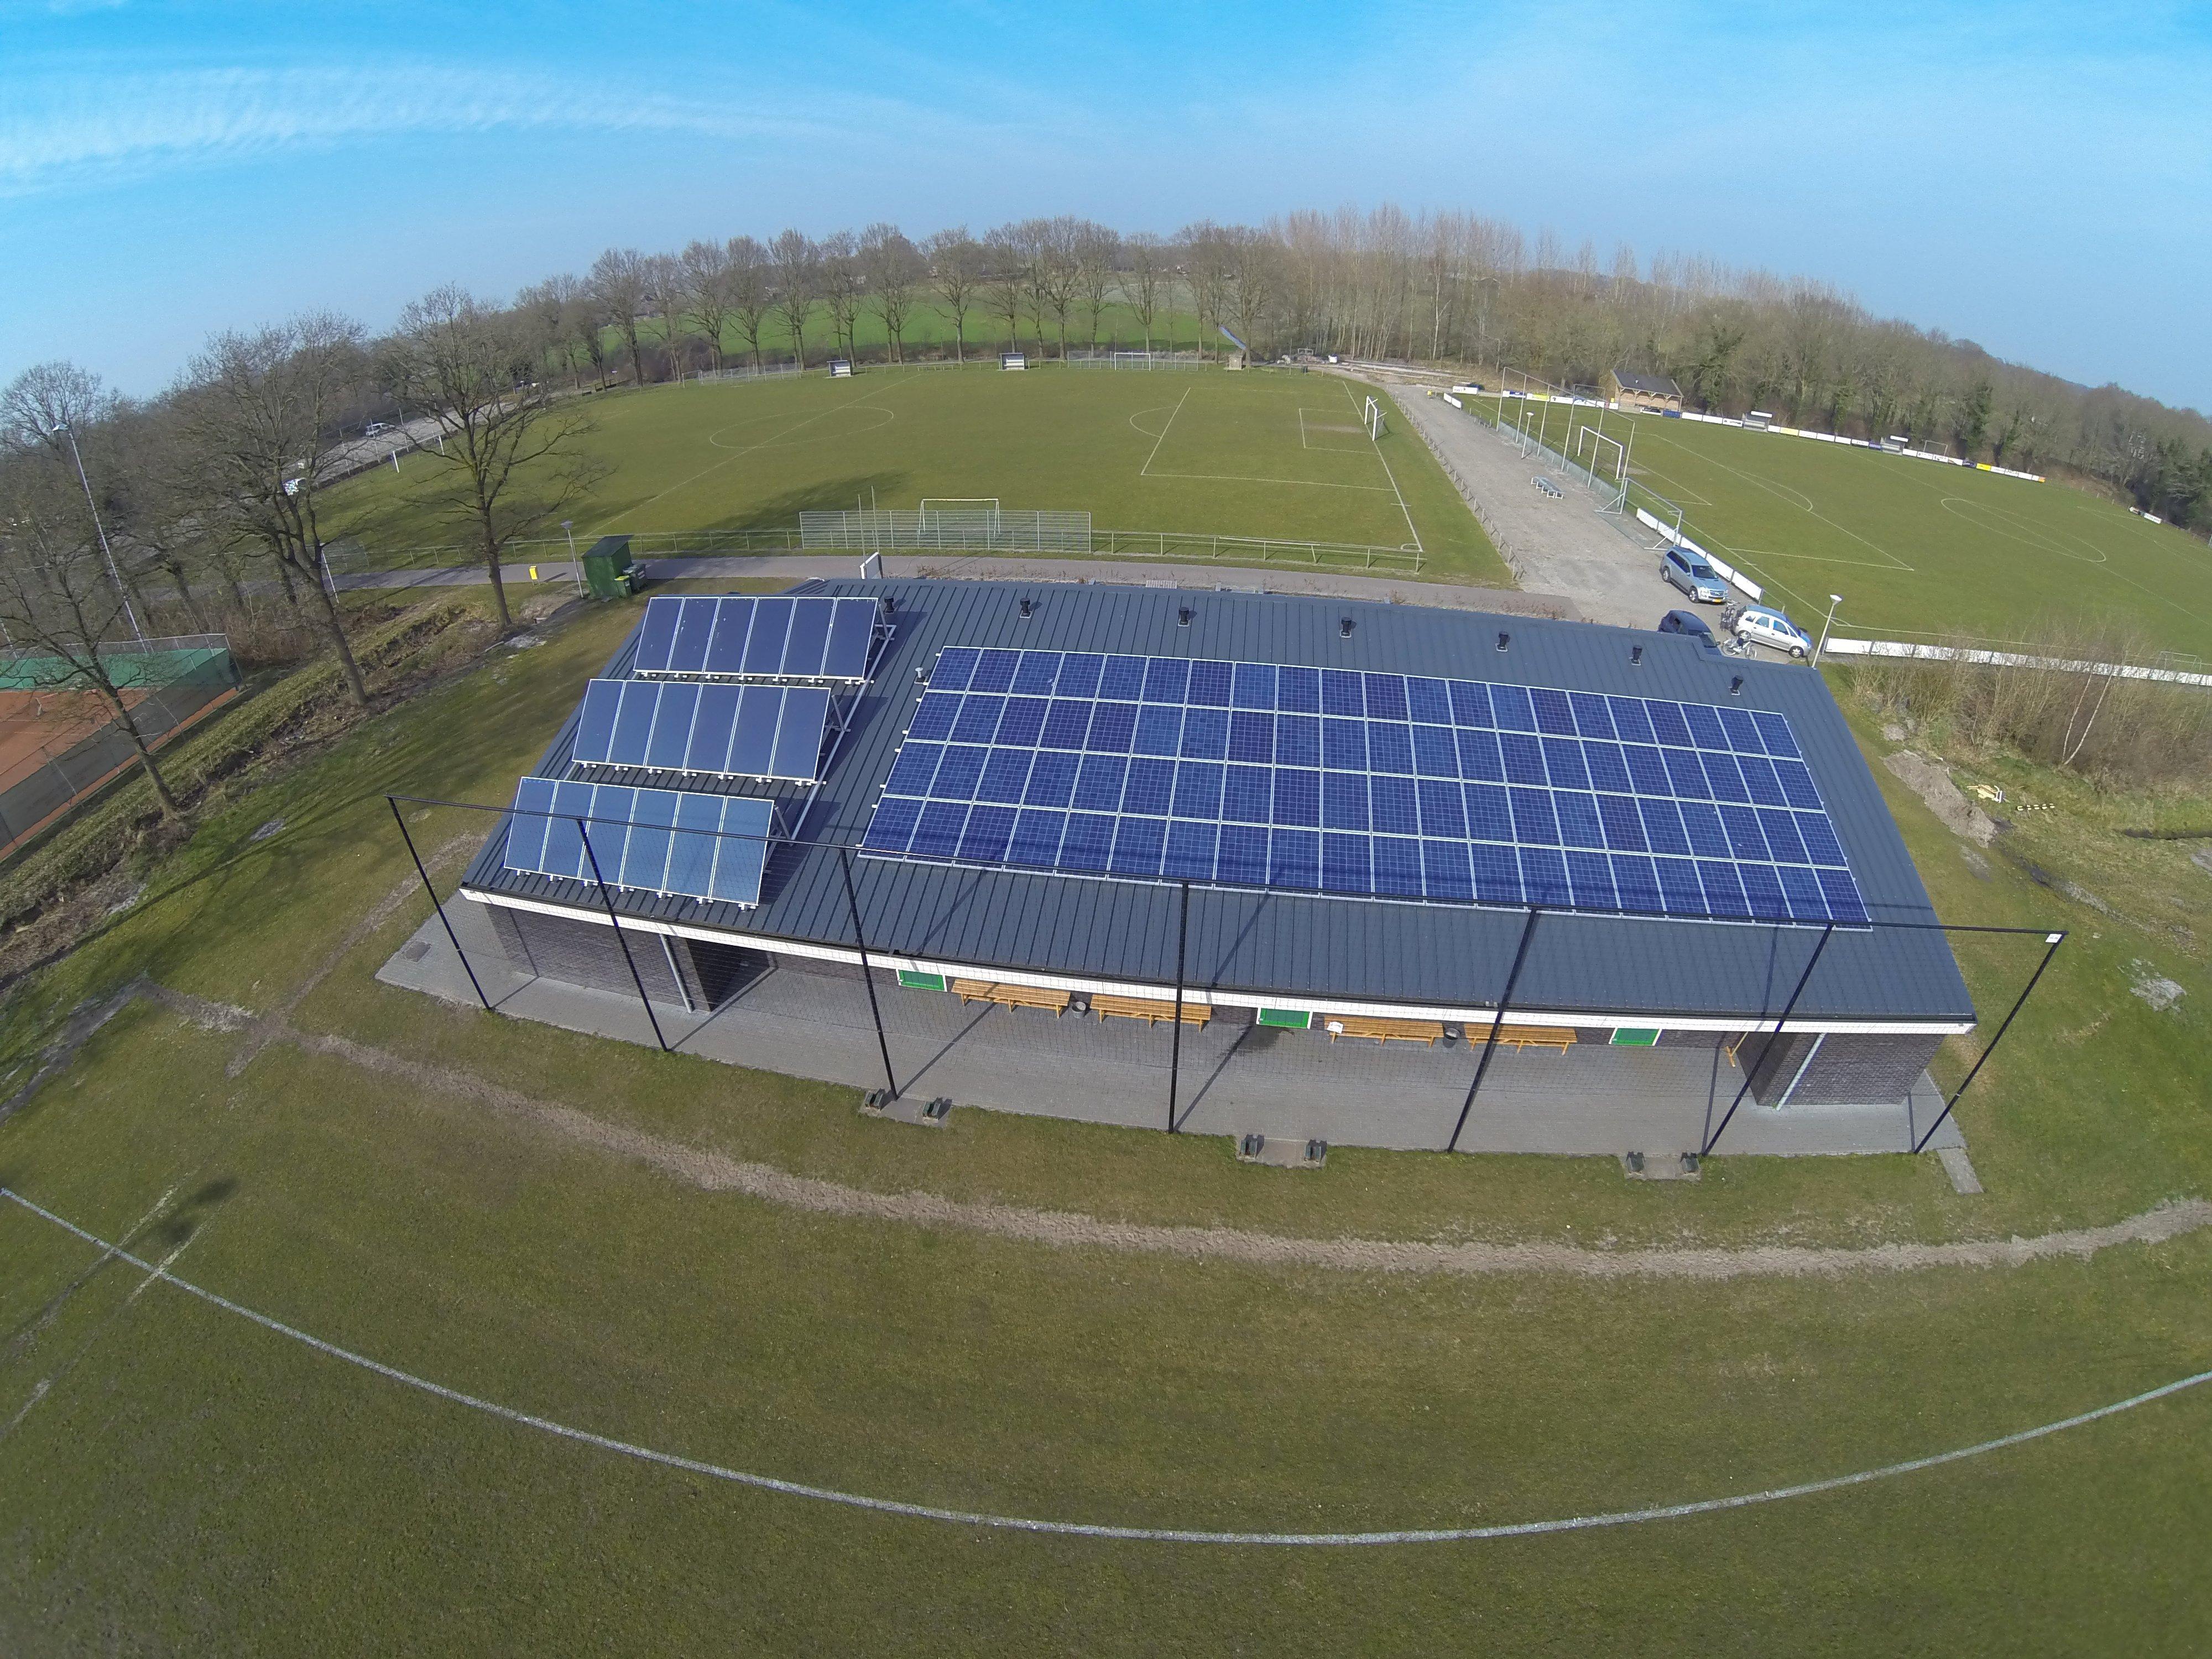 Sportclubs azen op subsidie voor energiebesparing - Vredenburg ...